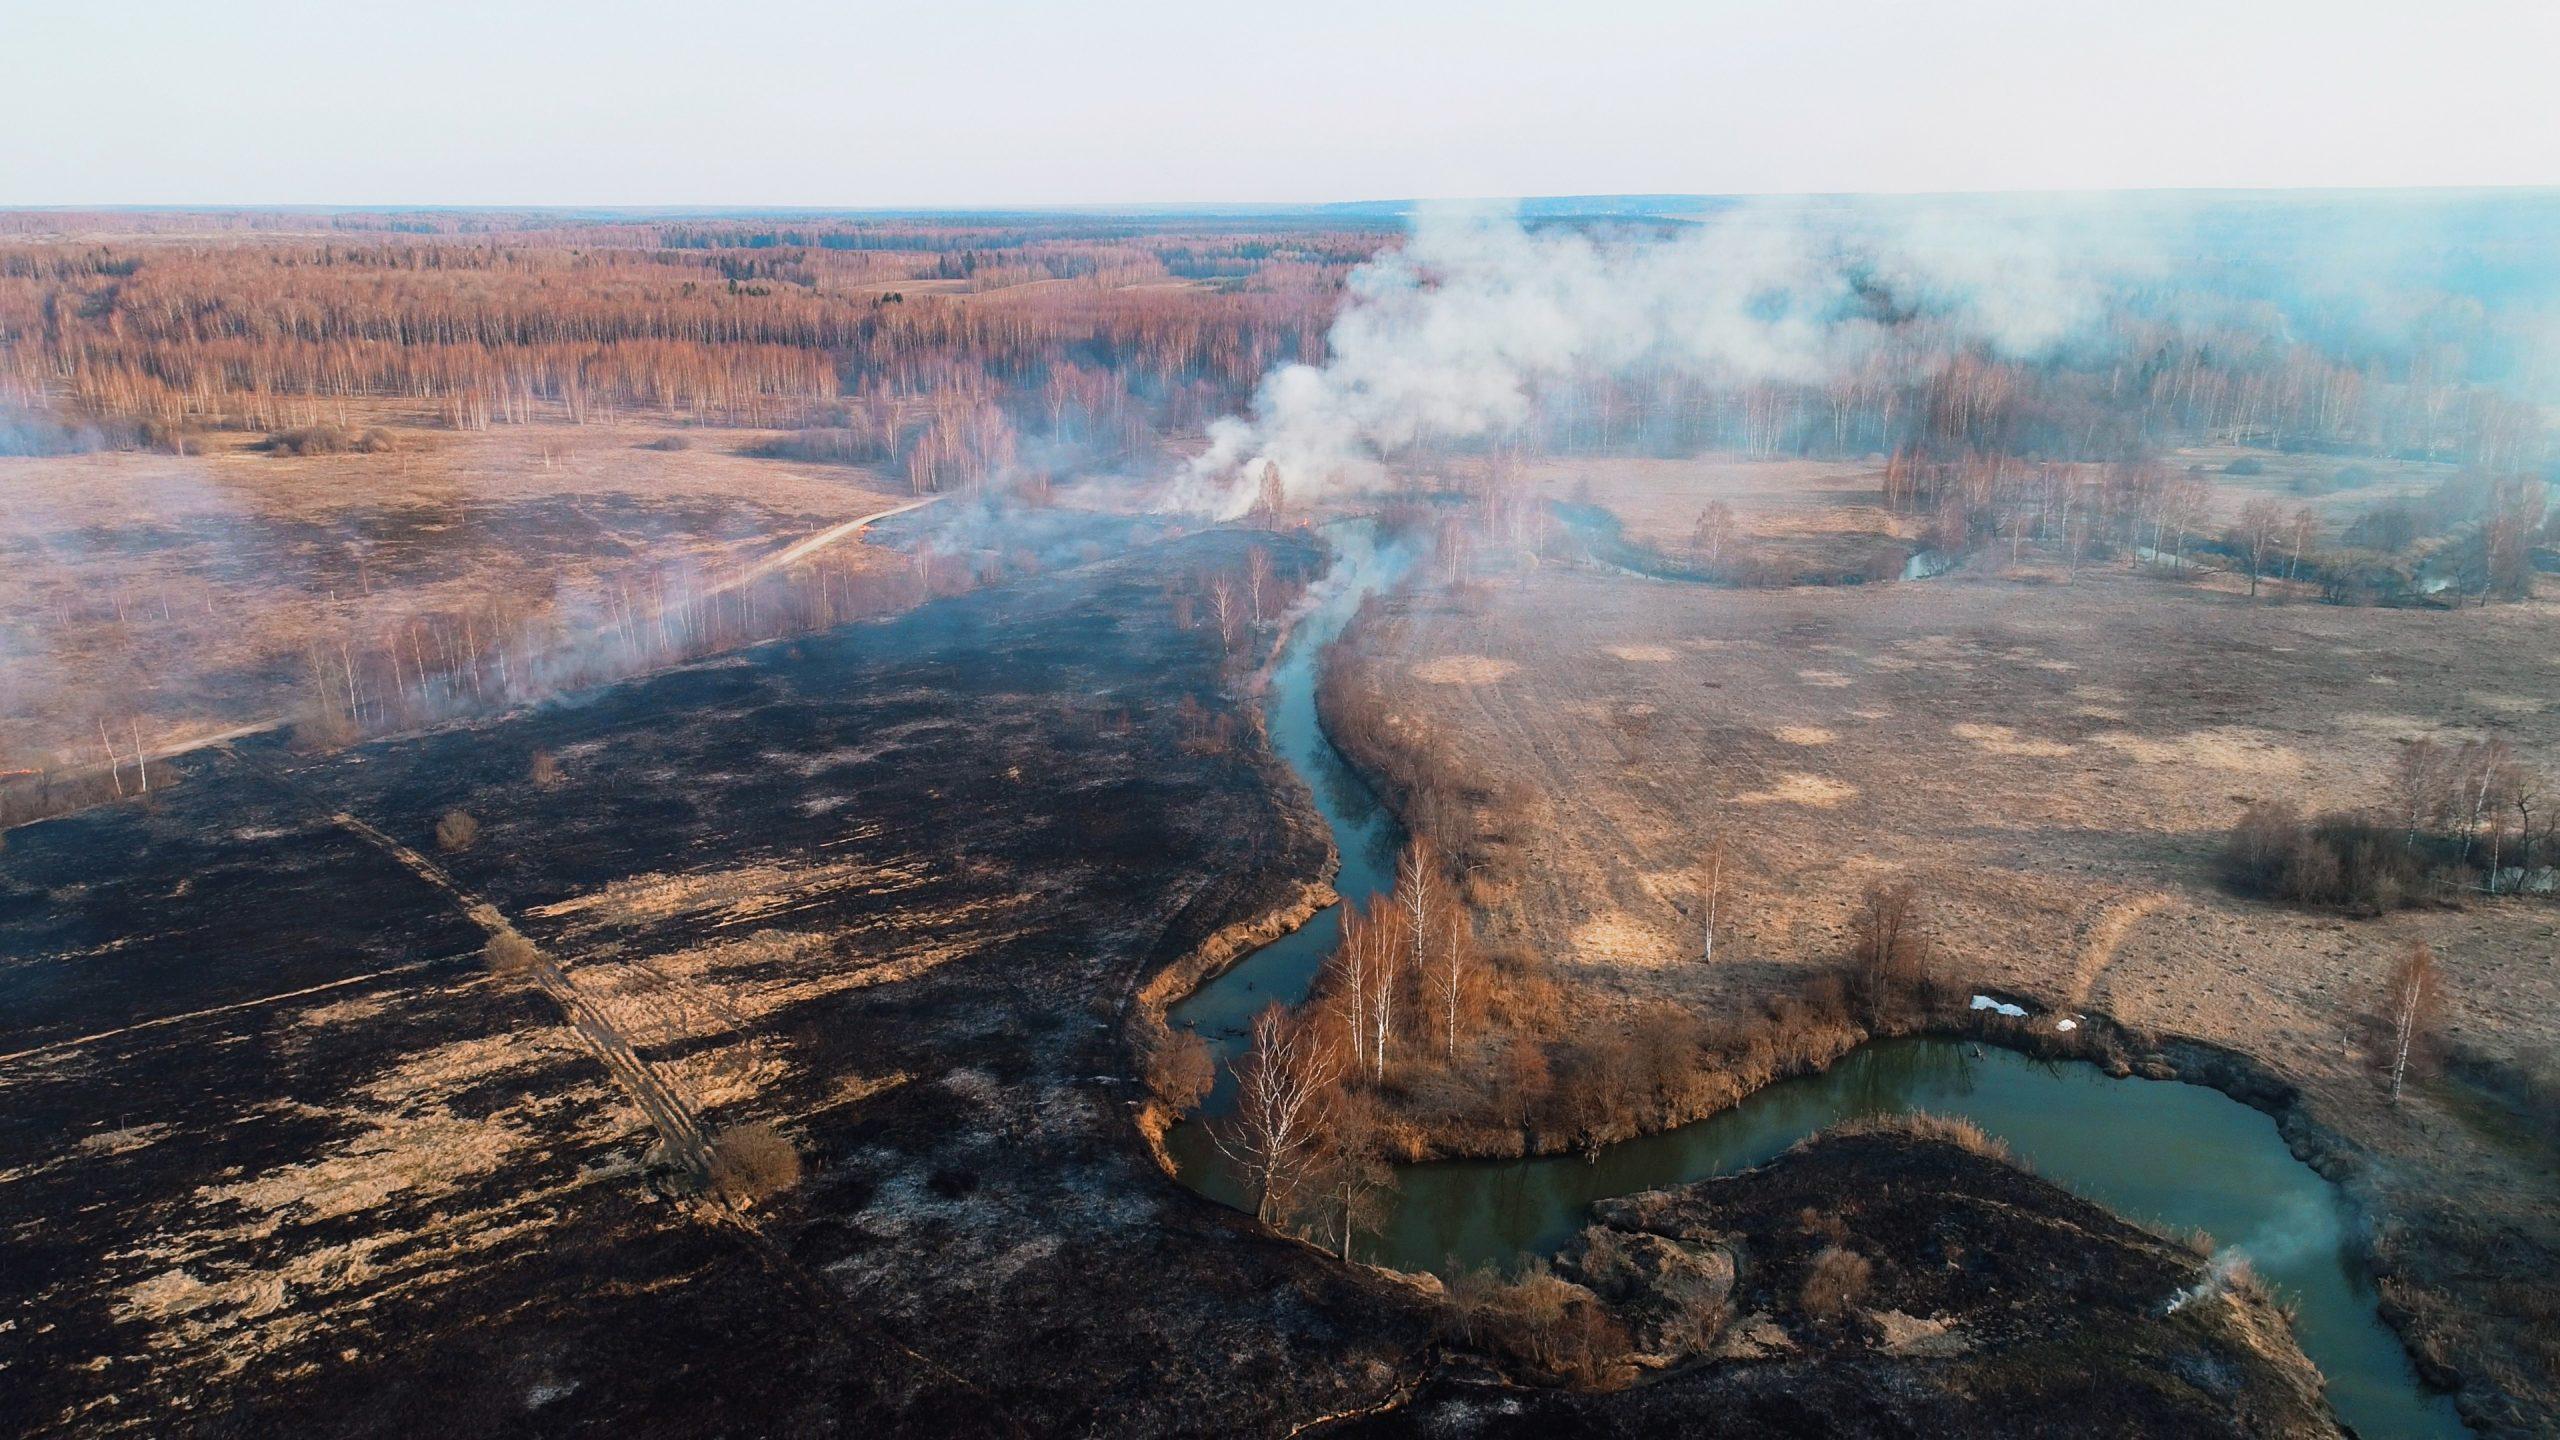 River<i>Dialogue</i>: Rivers on Fire